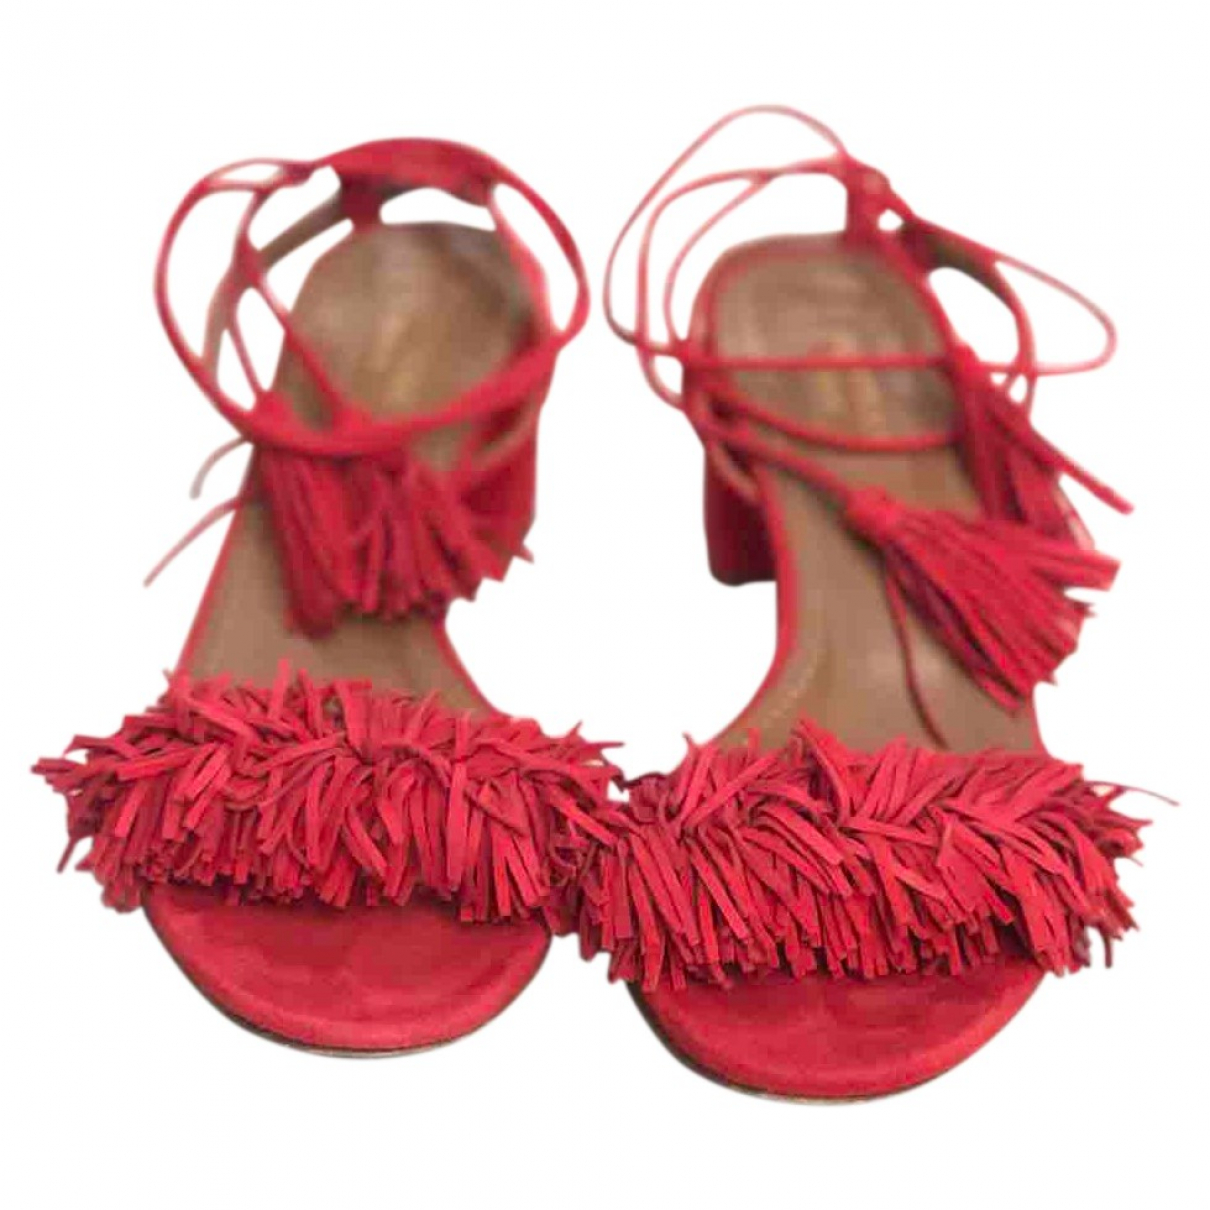 Aquazzura Wild Thing Red Suede Sandals for Women 36.5 EU